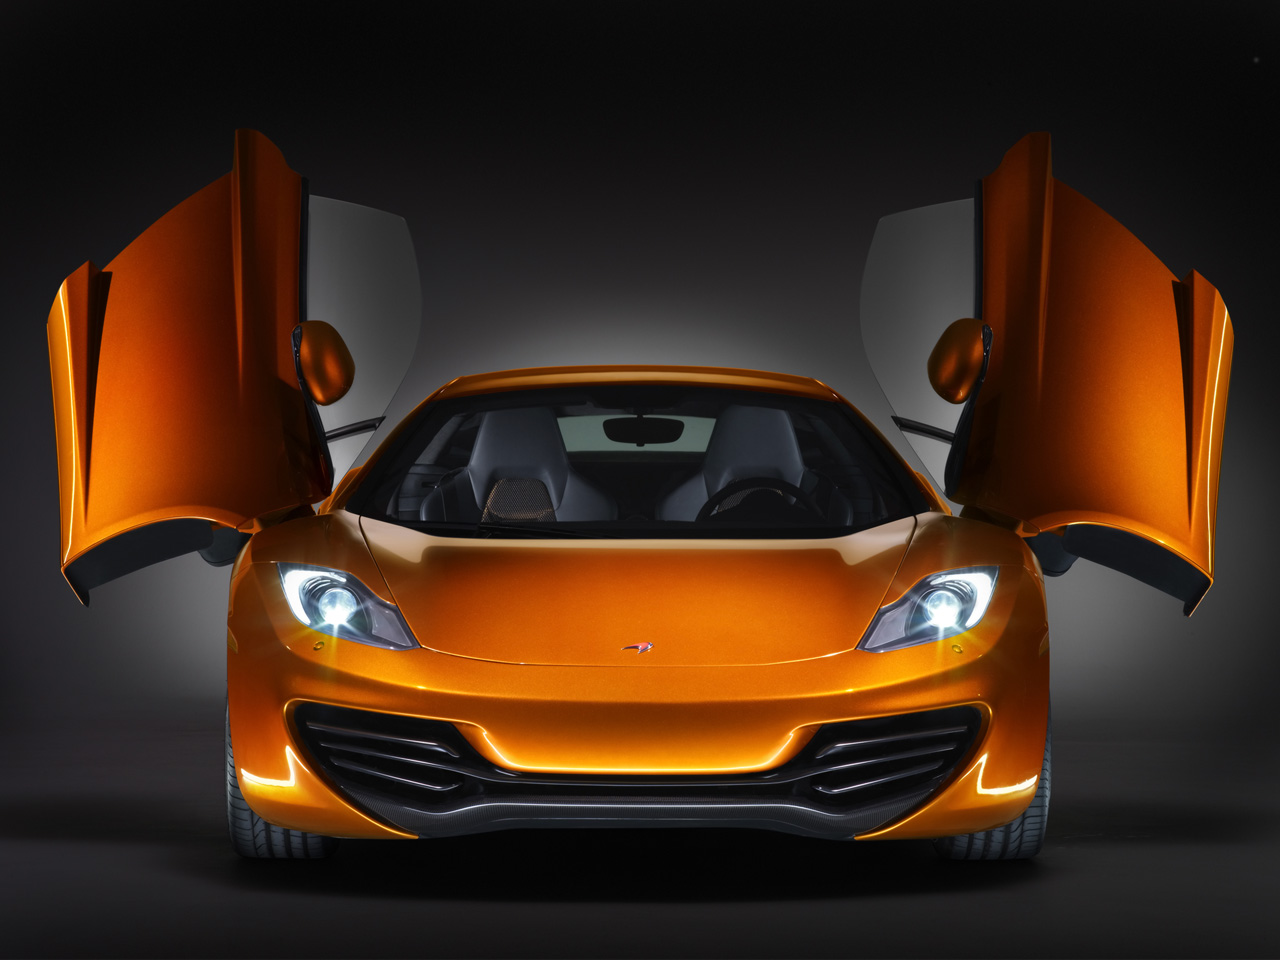 McLaren Sport Car, спортивная машина, фото, вид спереди